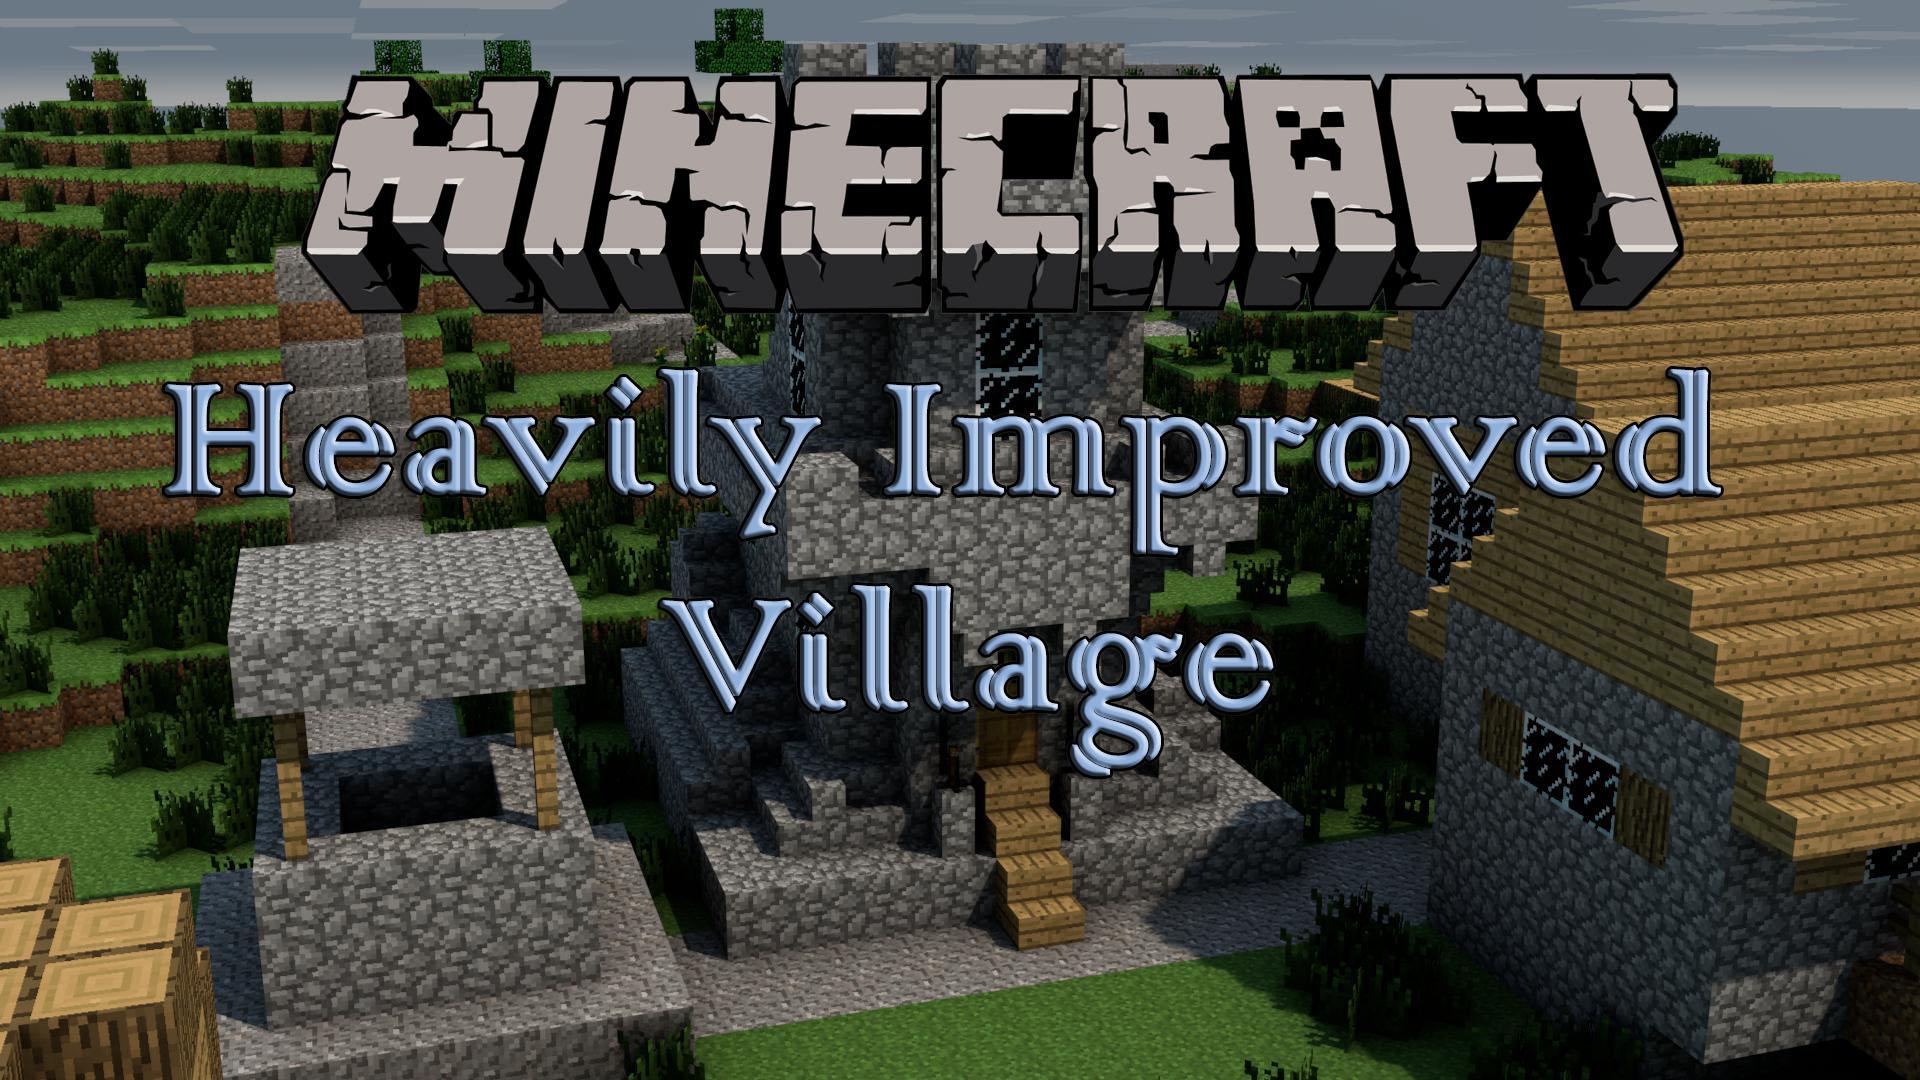 Heavily Improved Village скриншот 1